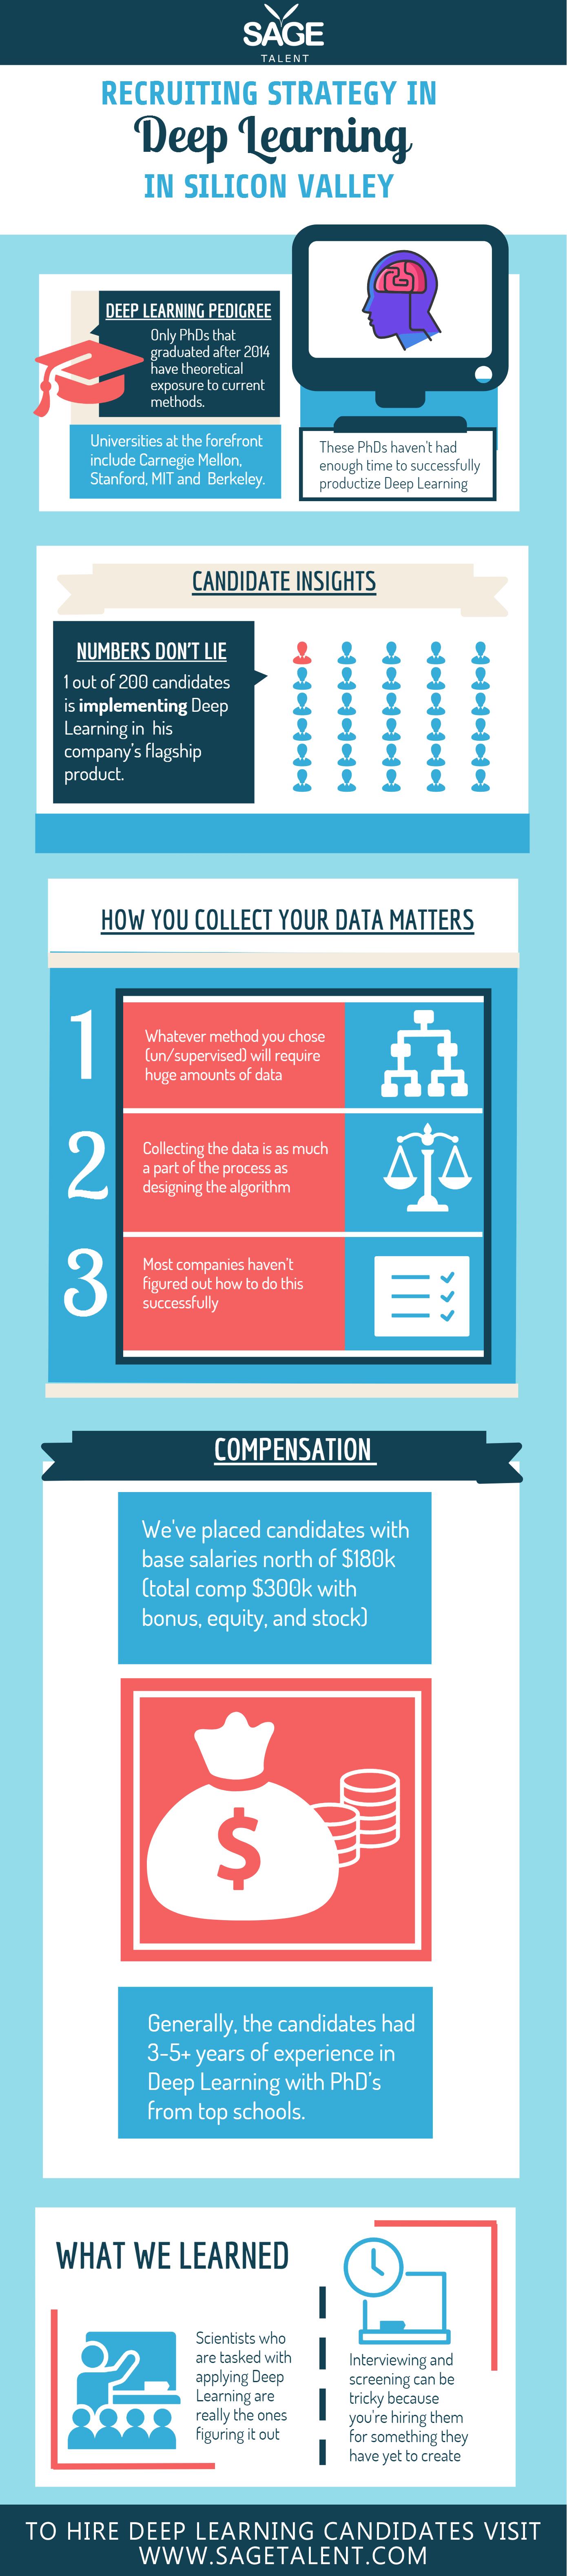 RecruitingSnapshotDeepLearning-8.png